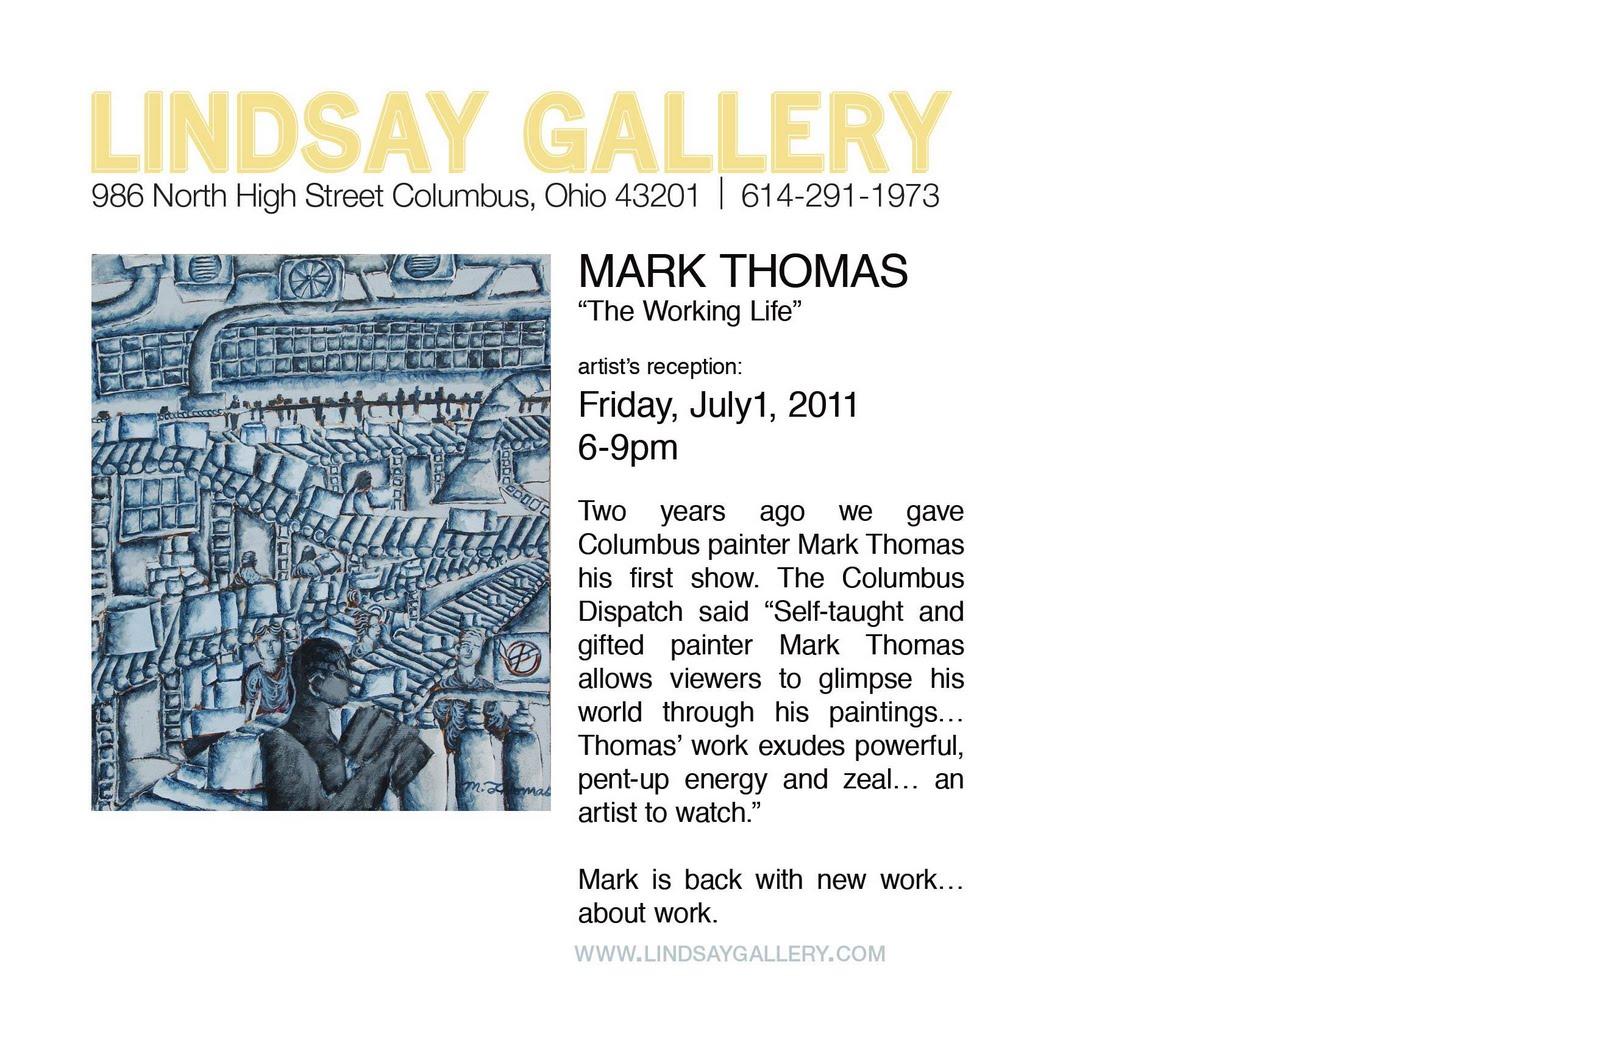 LINDSAY GALLERY: Artist's reception: MARK THOMAS, July 1